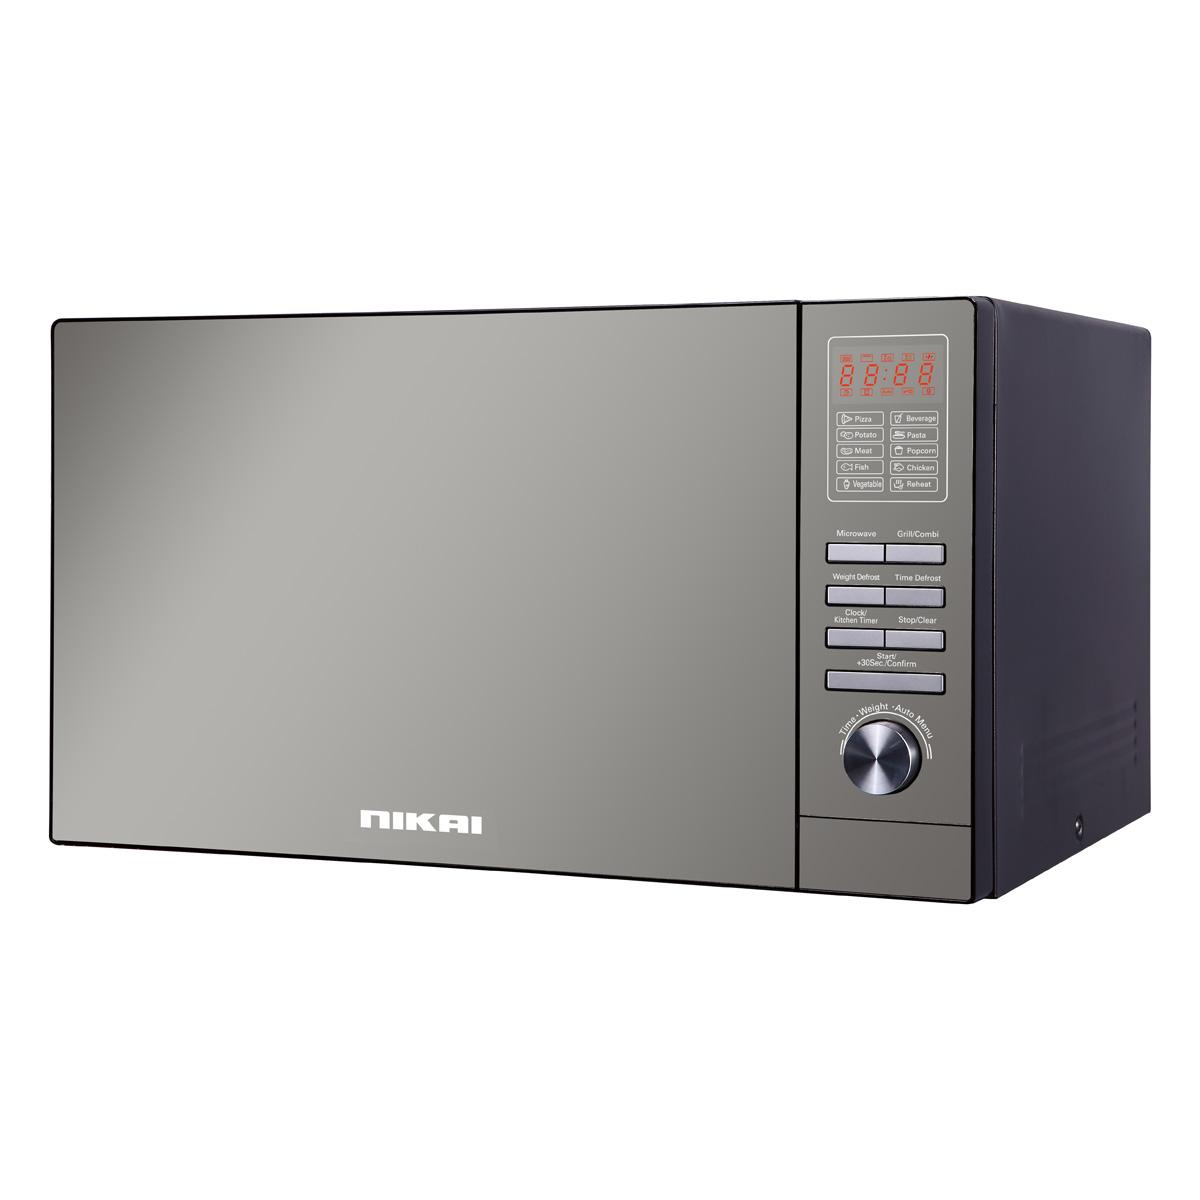 Nikai 25 Liter Microwave Oven NMO250MDG - Gray